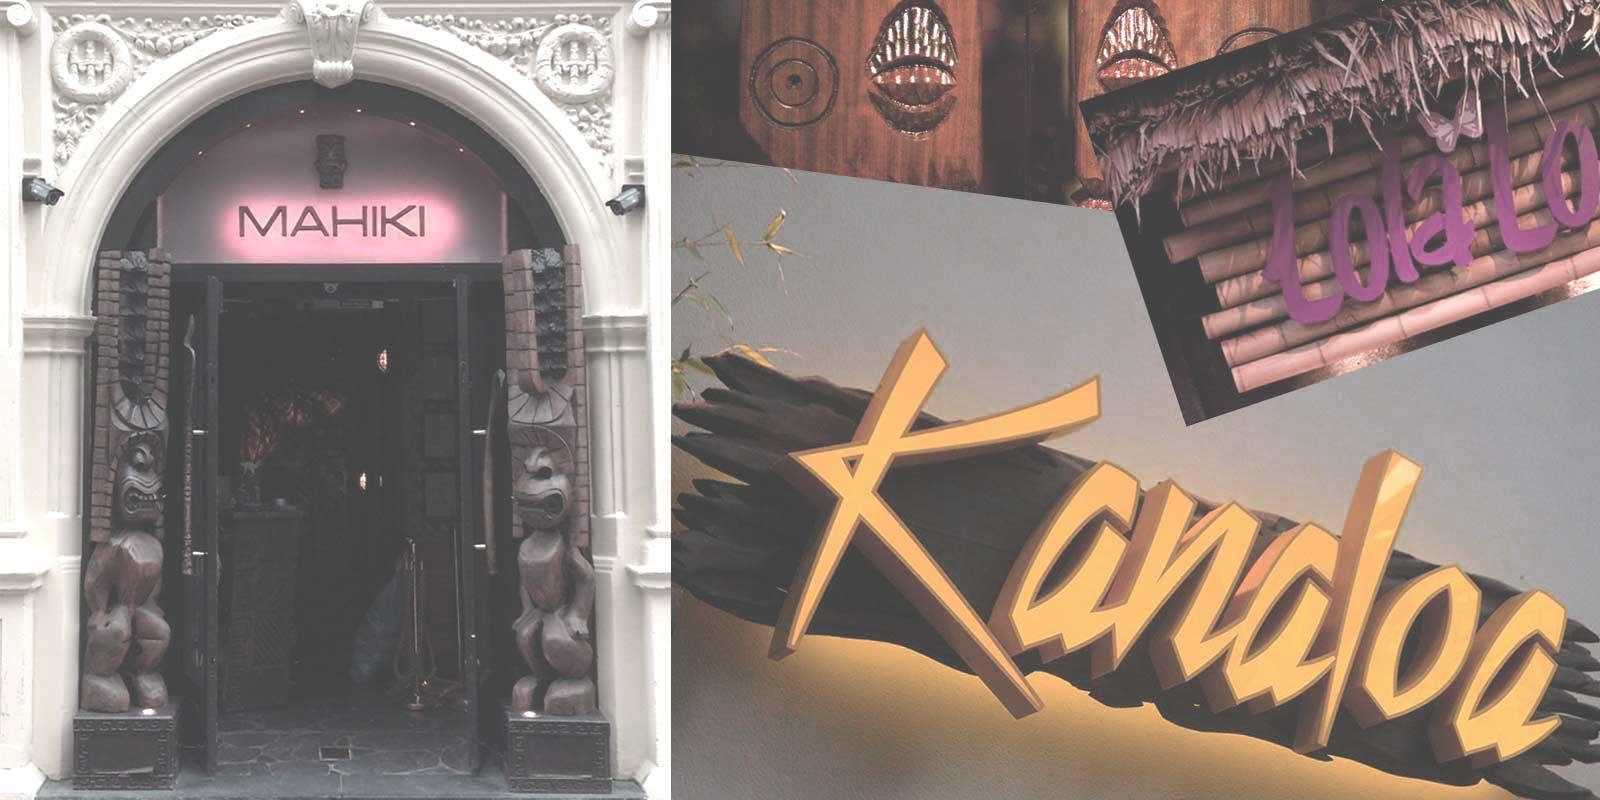 Exterior signage shots of Mahiki, Lola Lo and Kanaloa